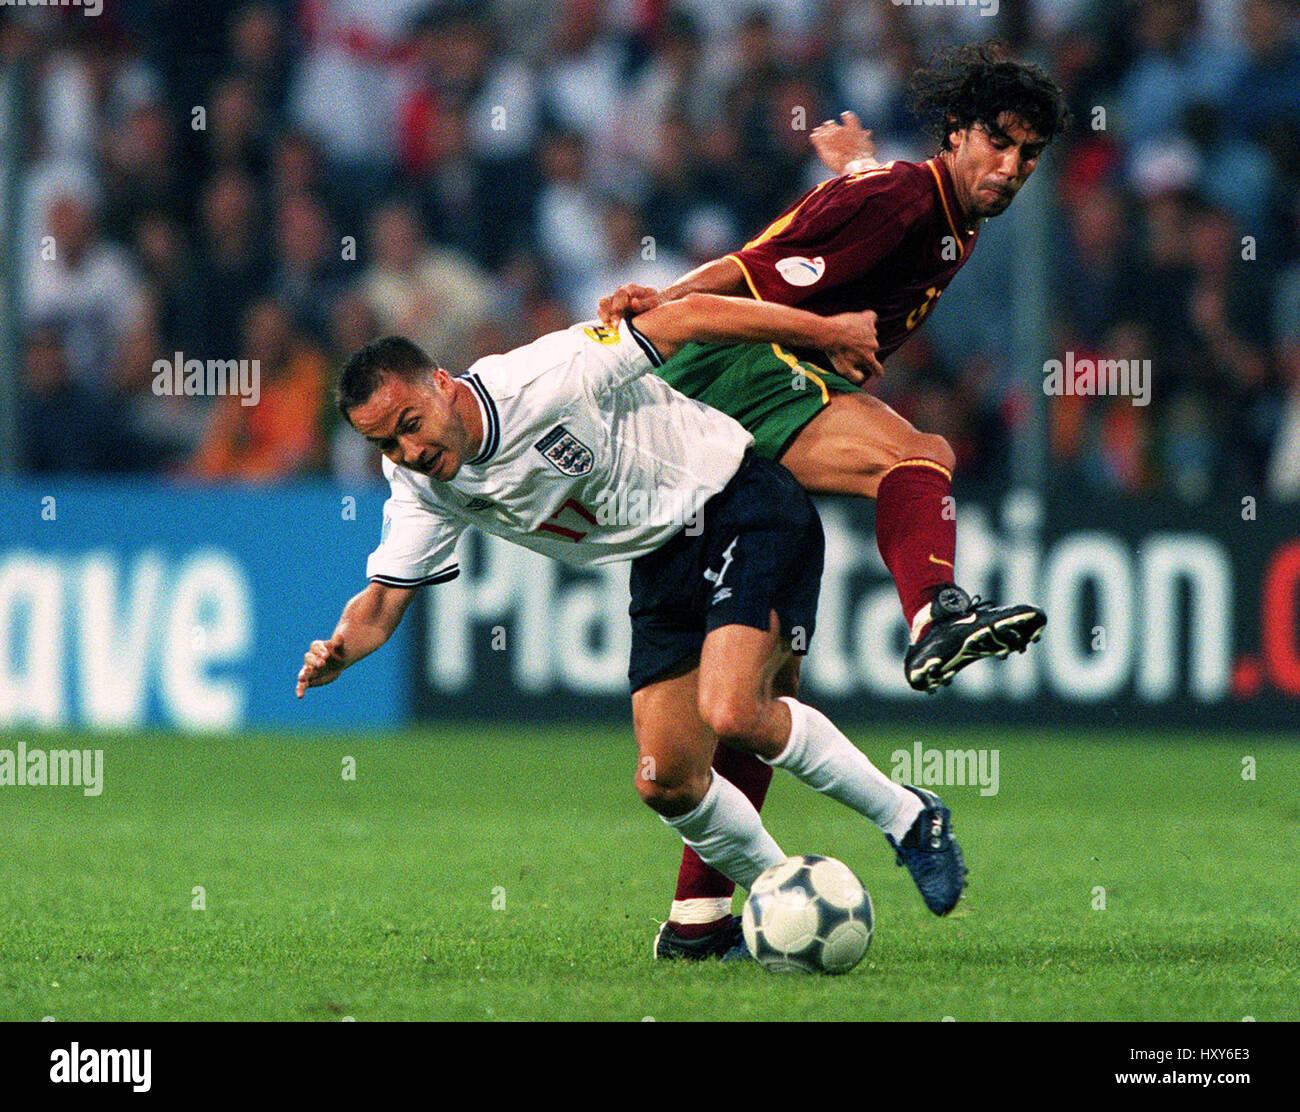 DENNIS WISE & MANUEL RUI COSTA PORTUGAL V ENGLAND 12 June 2000